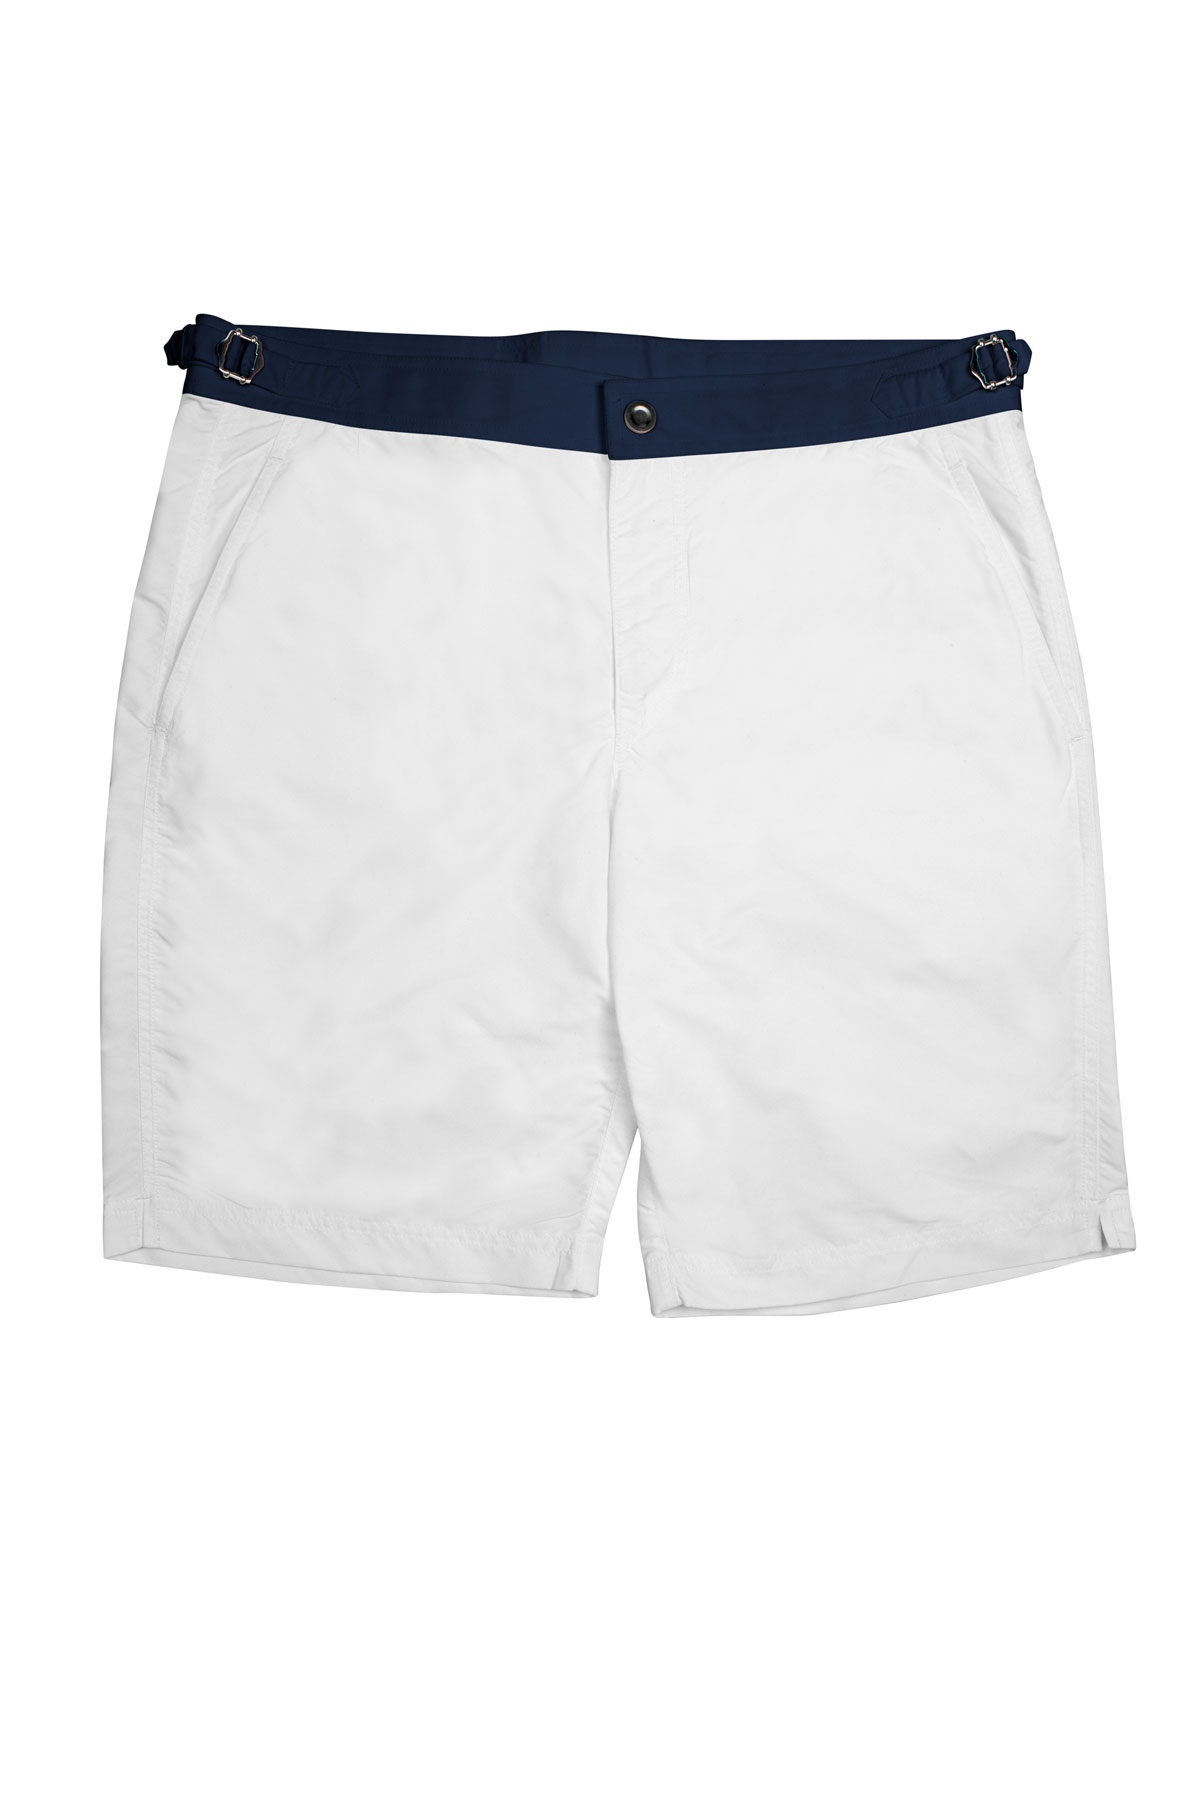 White Swim Shorts w Navy Waistband